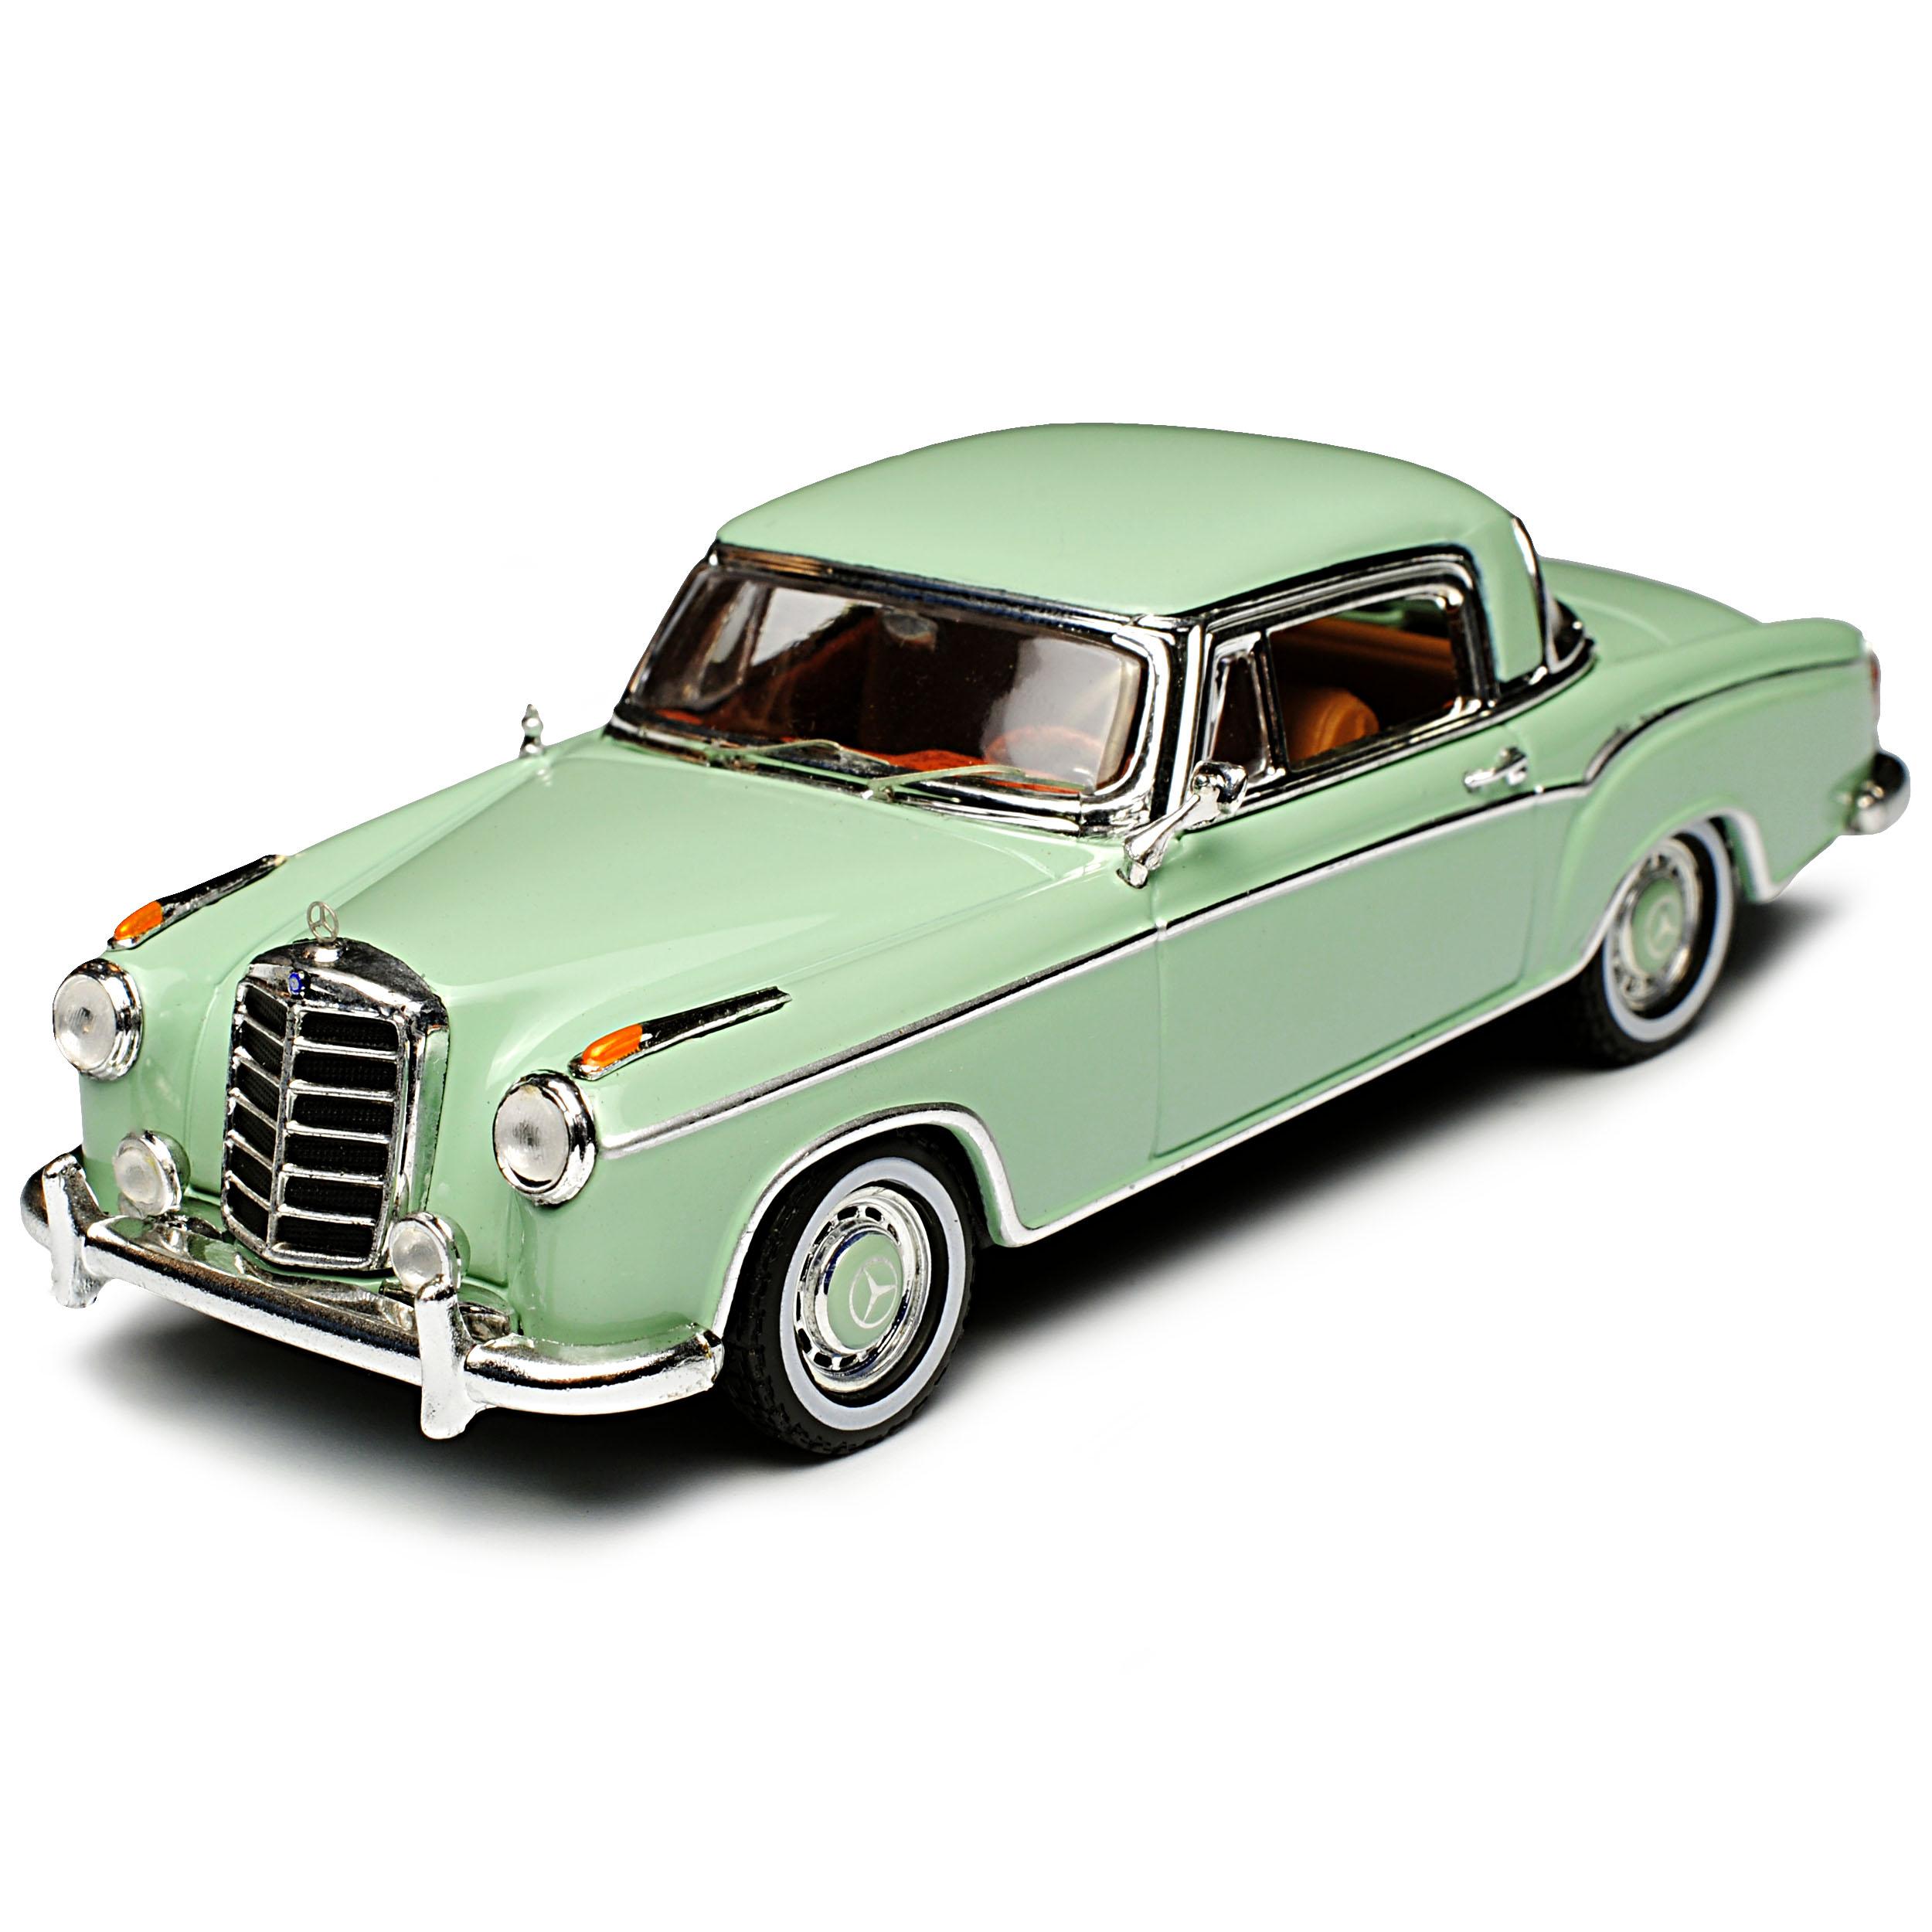 Mercedes-benz 220se Coupe verde claro pequeño Ponton w128 1954-1960 1//43 vitesse...